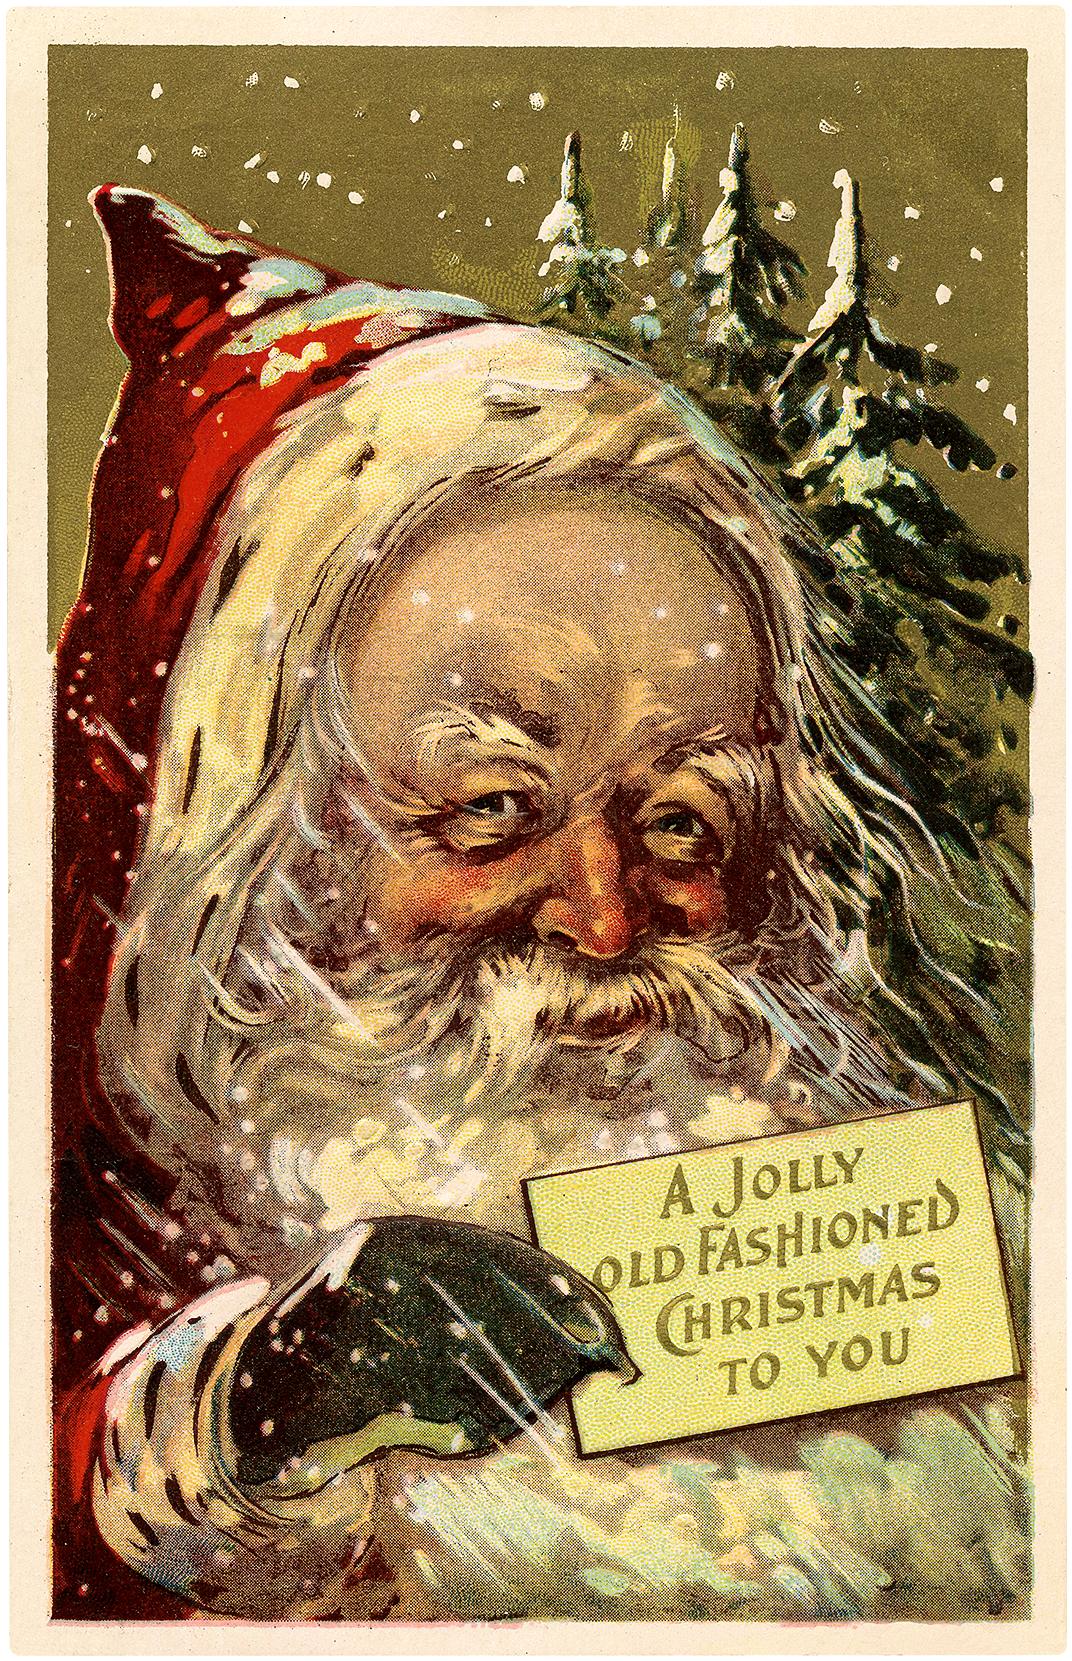 Old Fashioned Santa Christmas Wish Postcard!